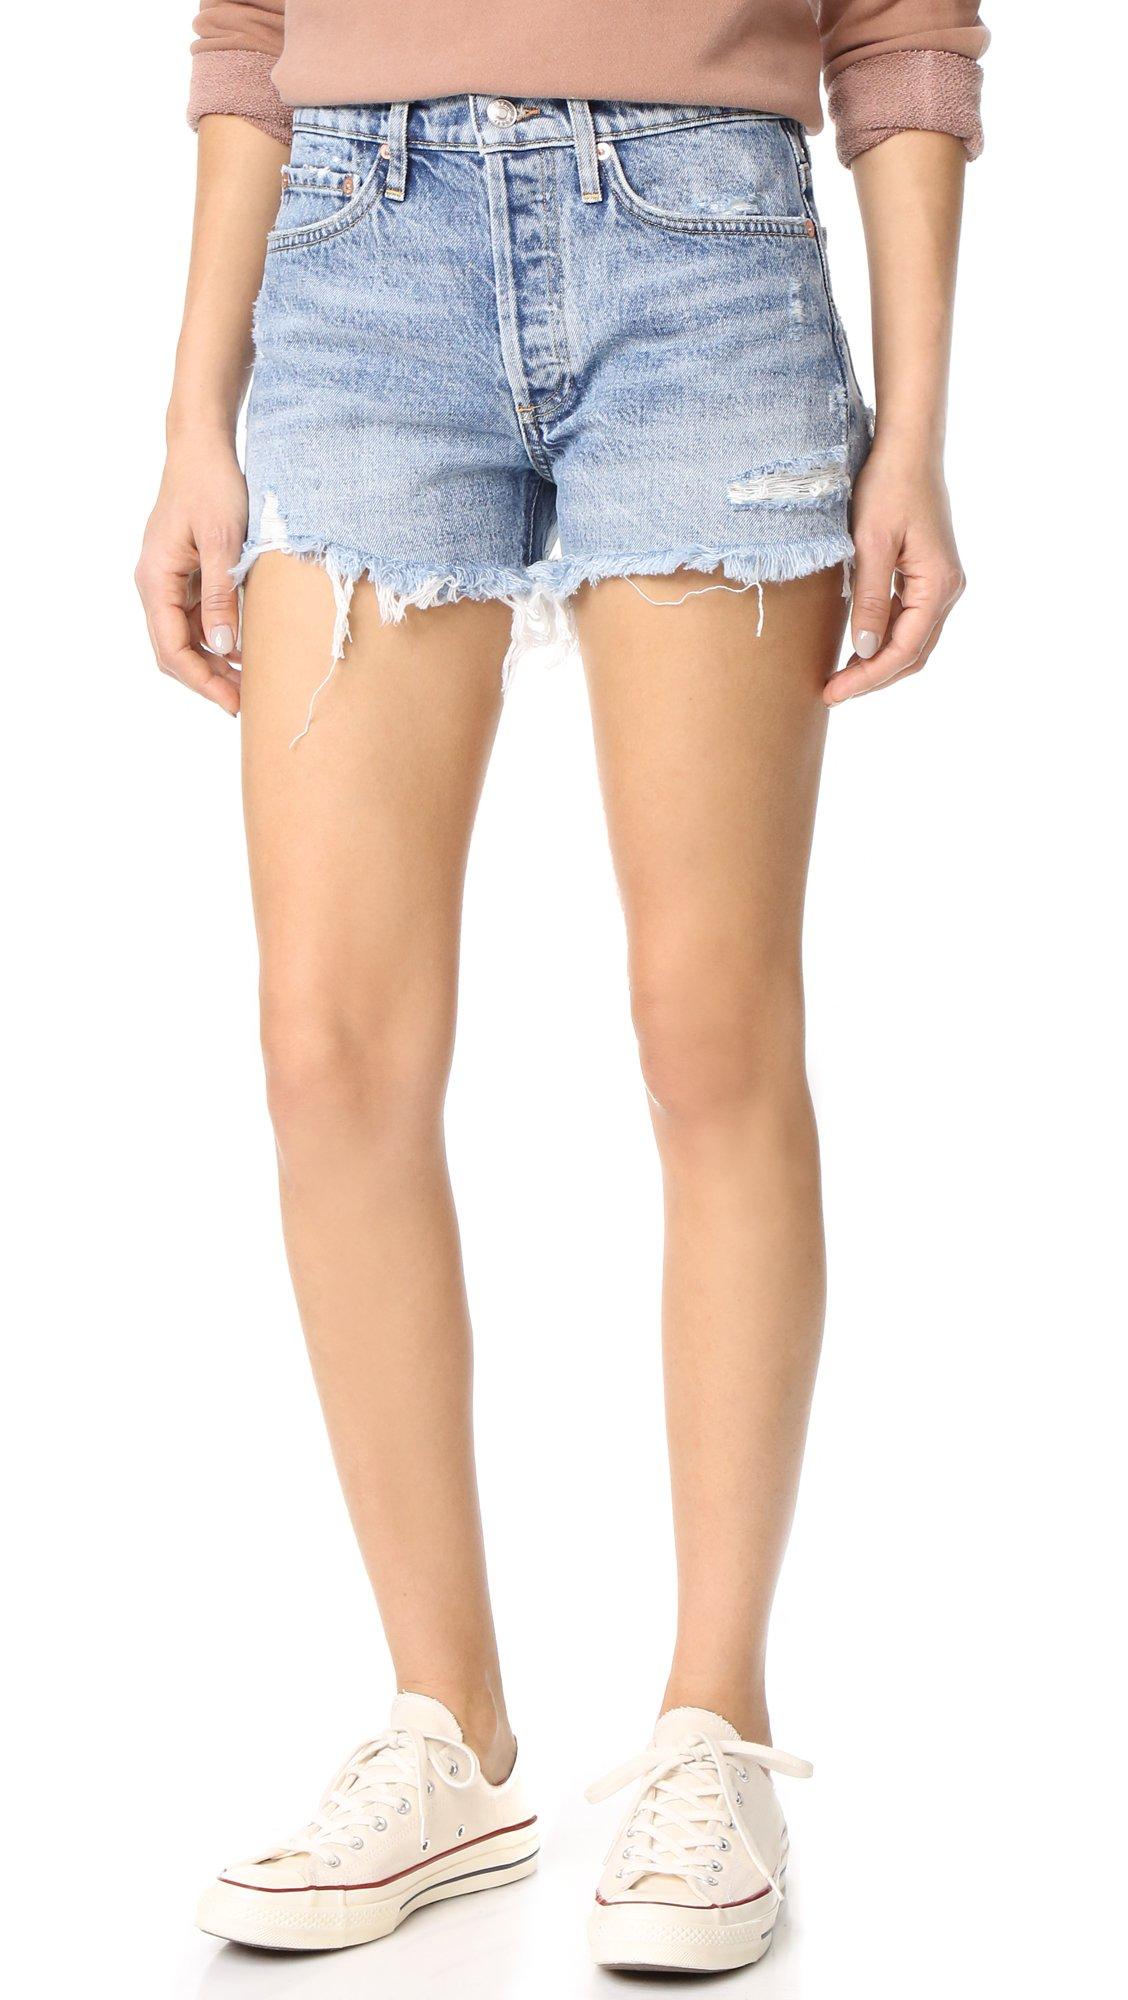 AGOLDE Women's Parker Vintage Loose Fit Cutoff Shorts, Swapmeet, 27